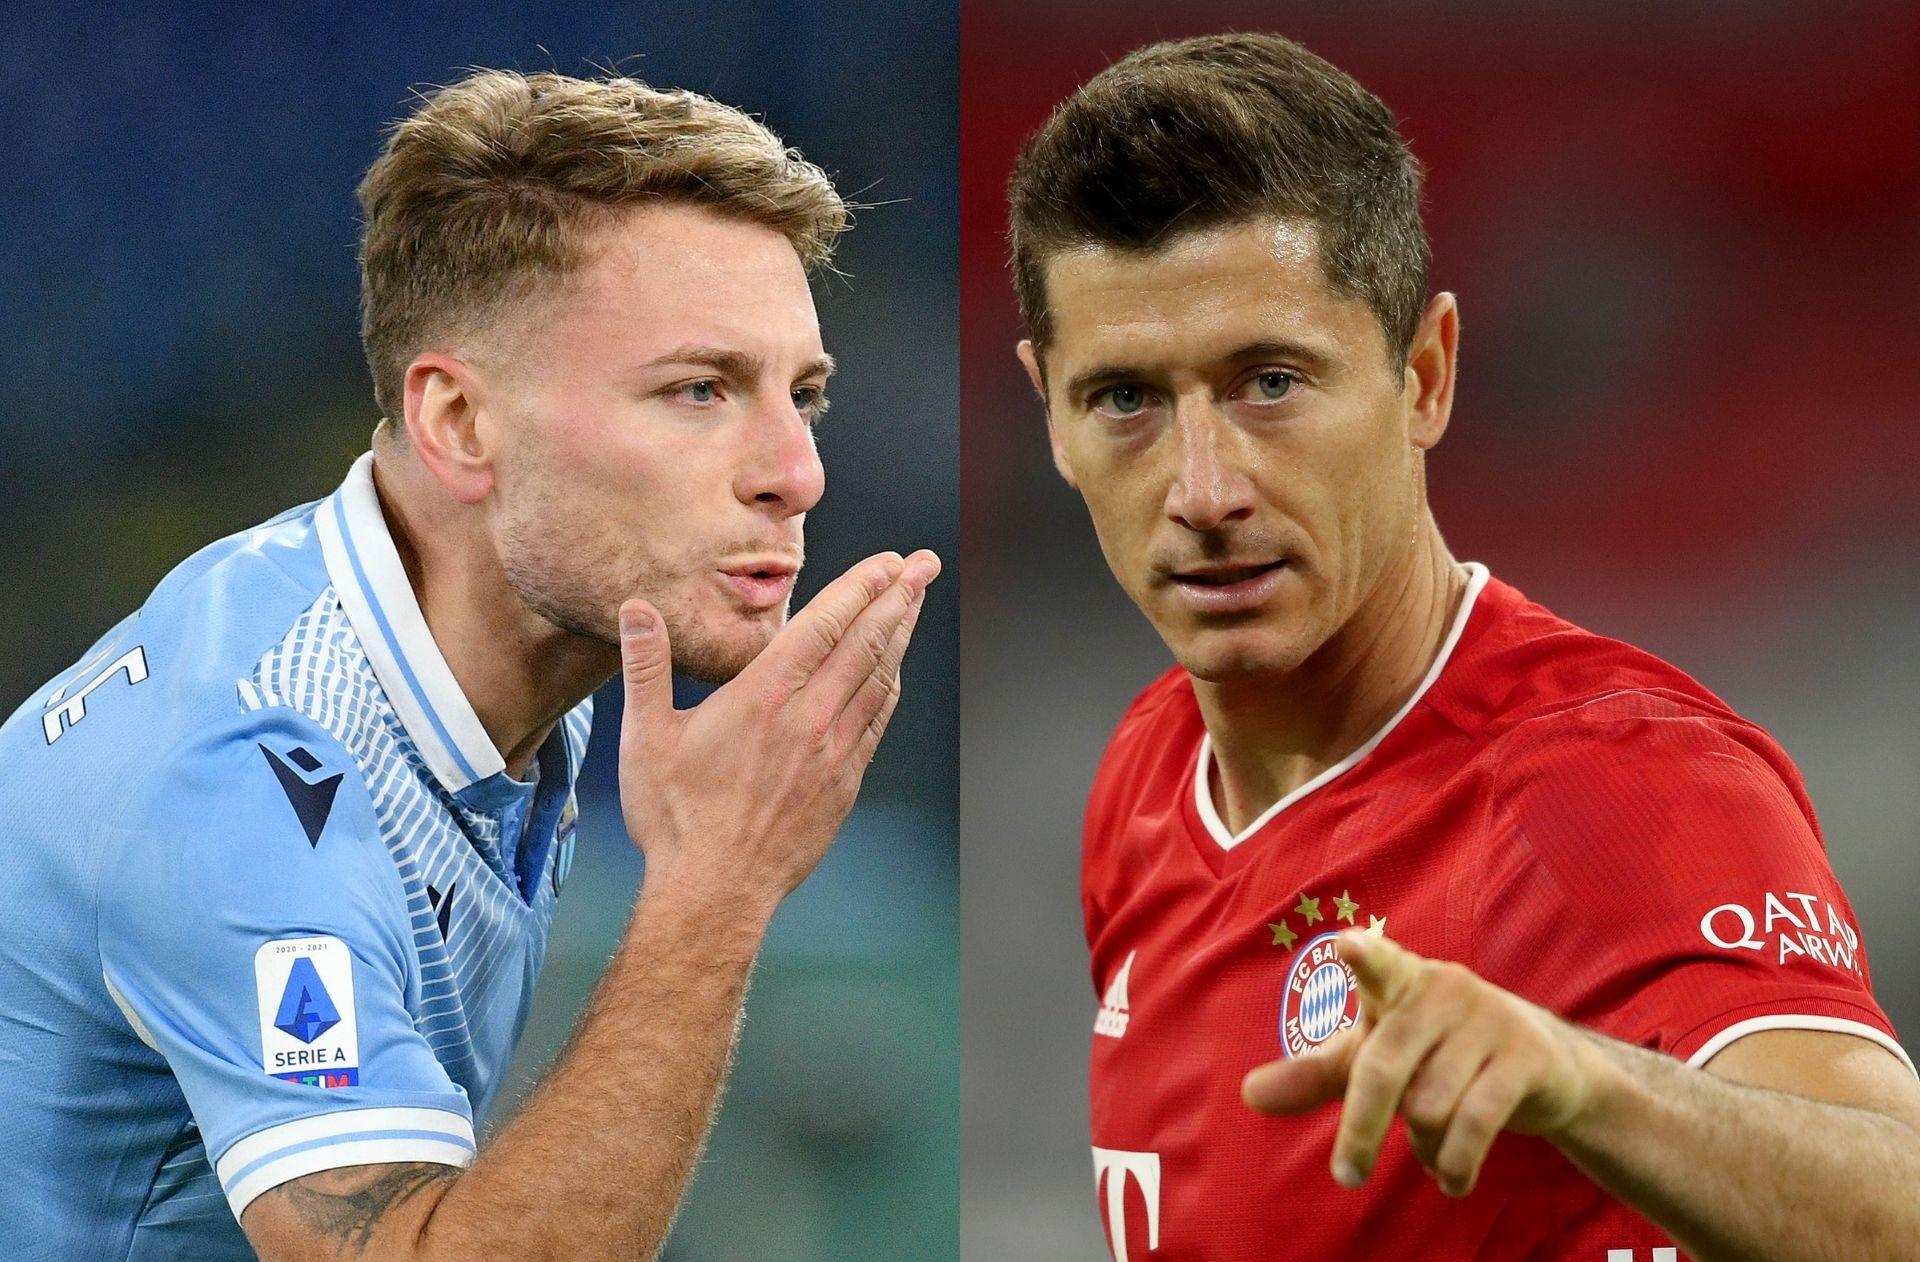 Ciro Immobile of Lazio, Robert Lewandowski of Bayern Munich